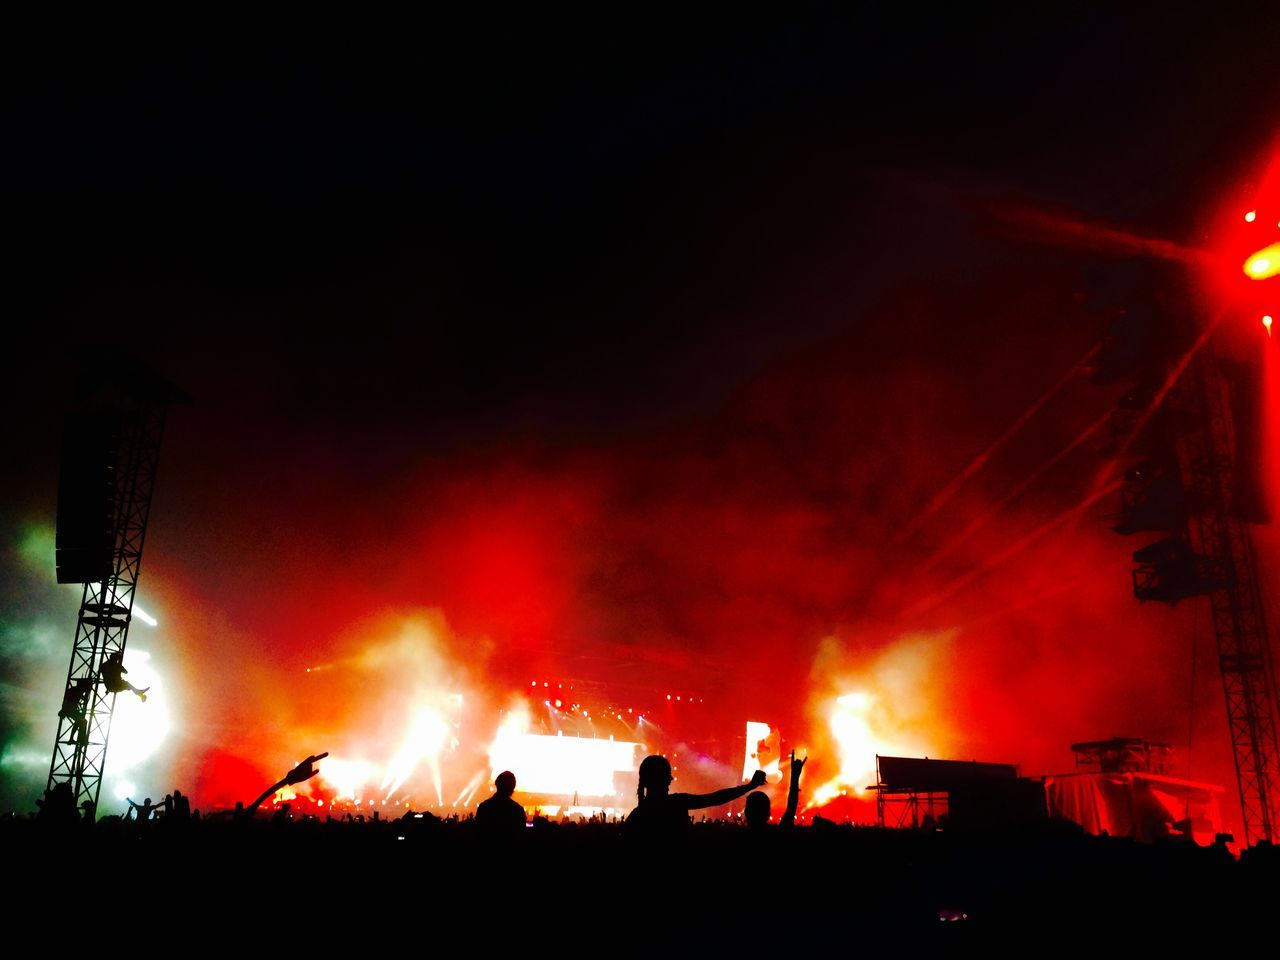 Rock am Ring Festival TheMoment-2015EyeEmAwards Dietotenhosen Summer Night Music Party People